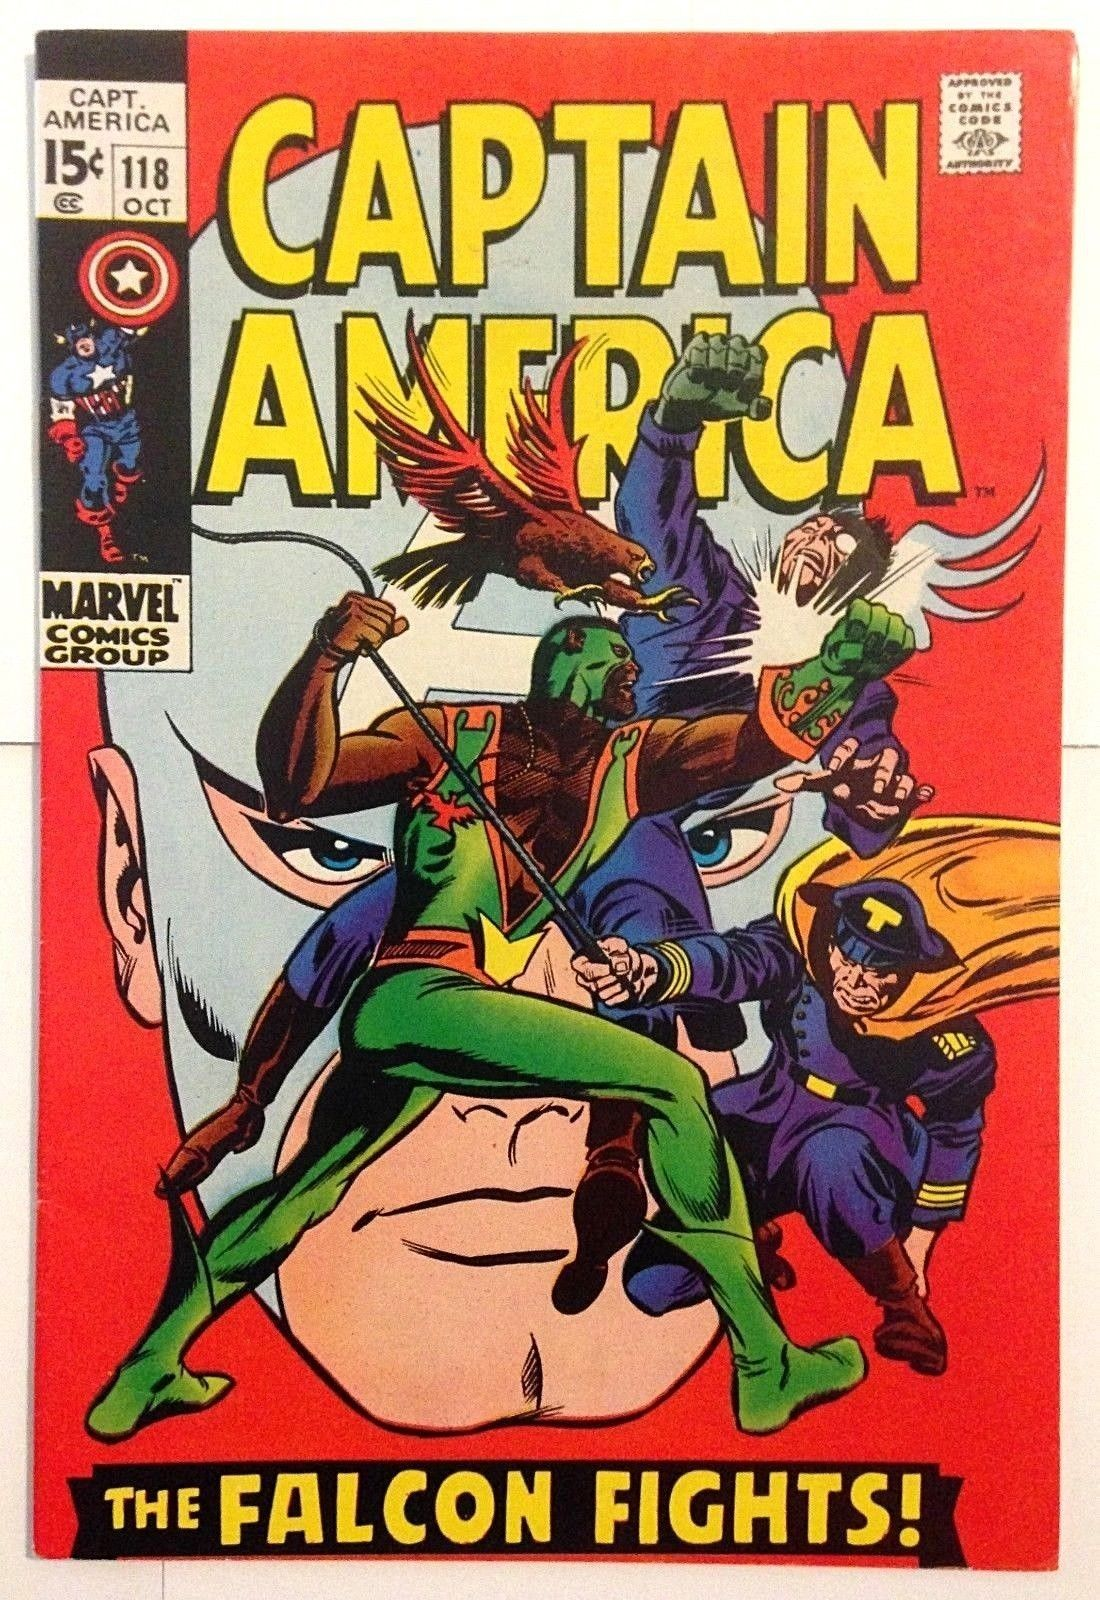 Captain America 118, 119, 120, 121, 122, 123, 124, 125, 126, 127, 128 HIGH GRADE